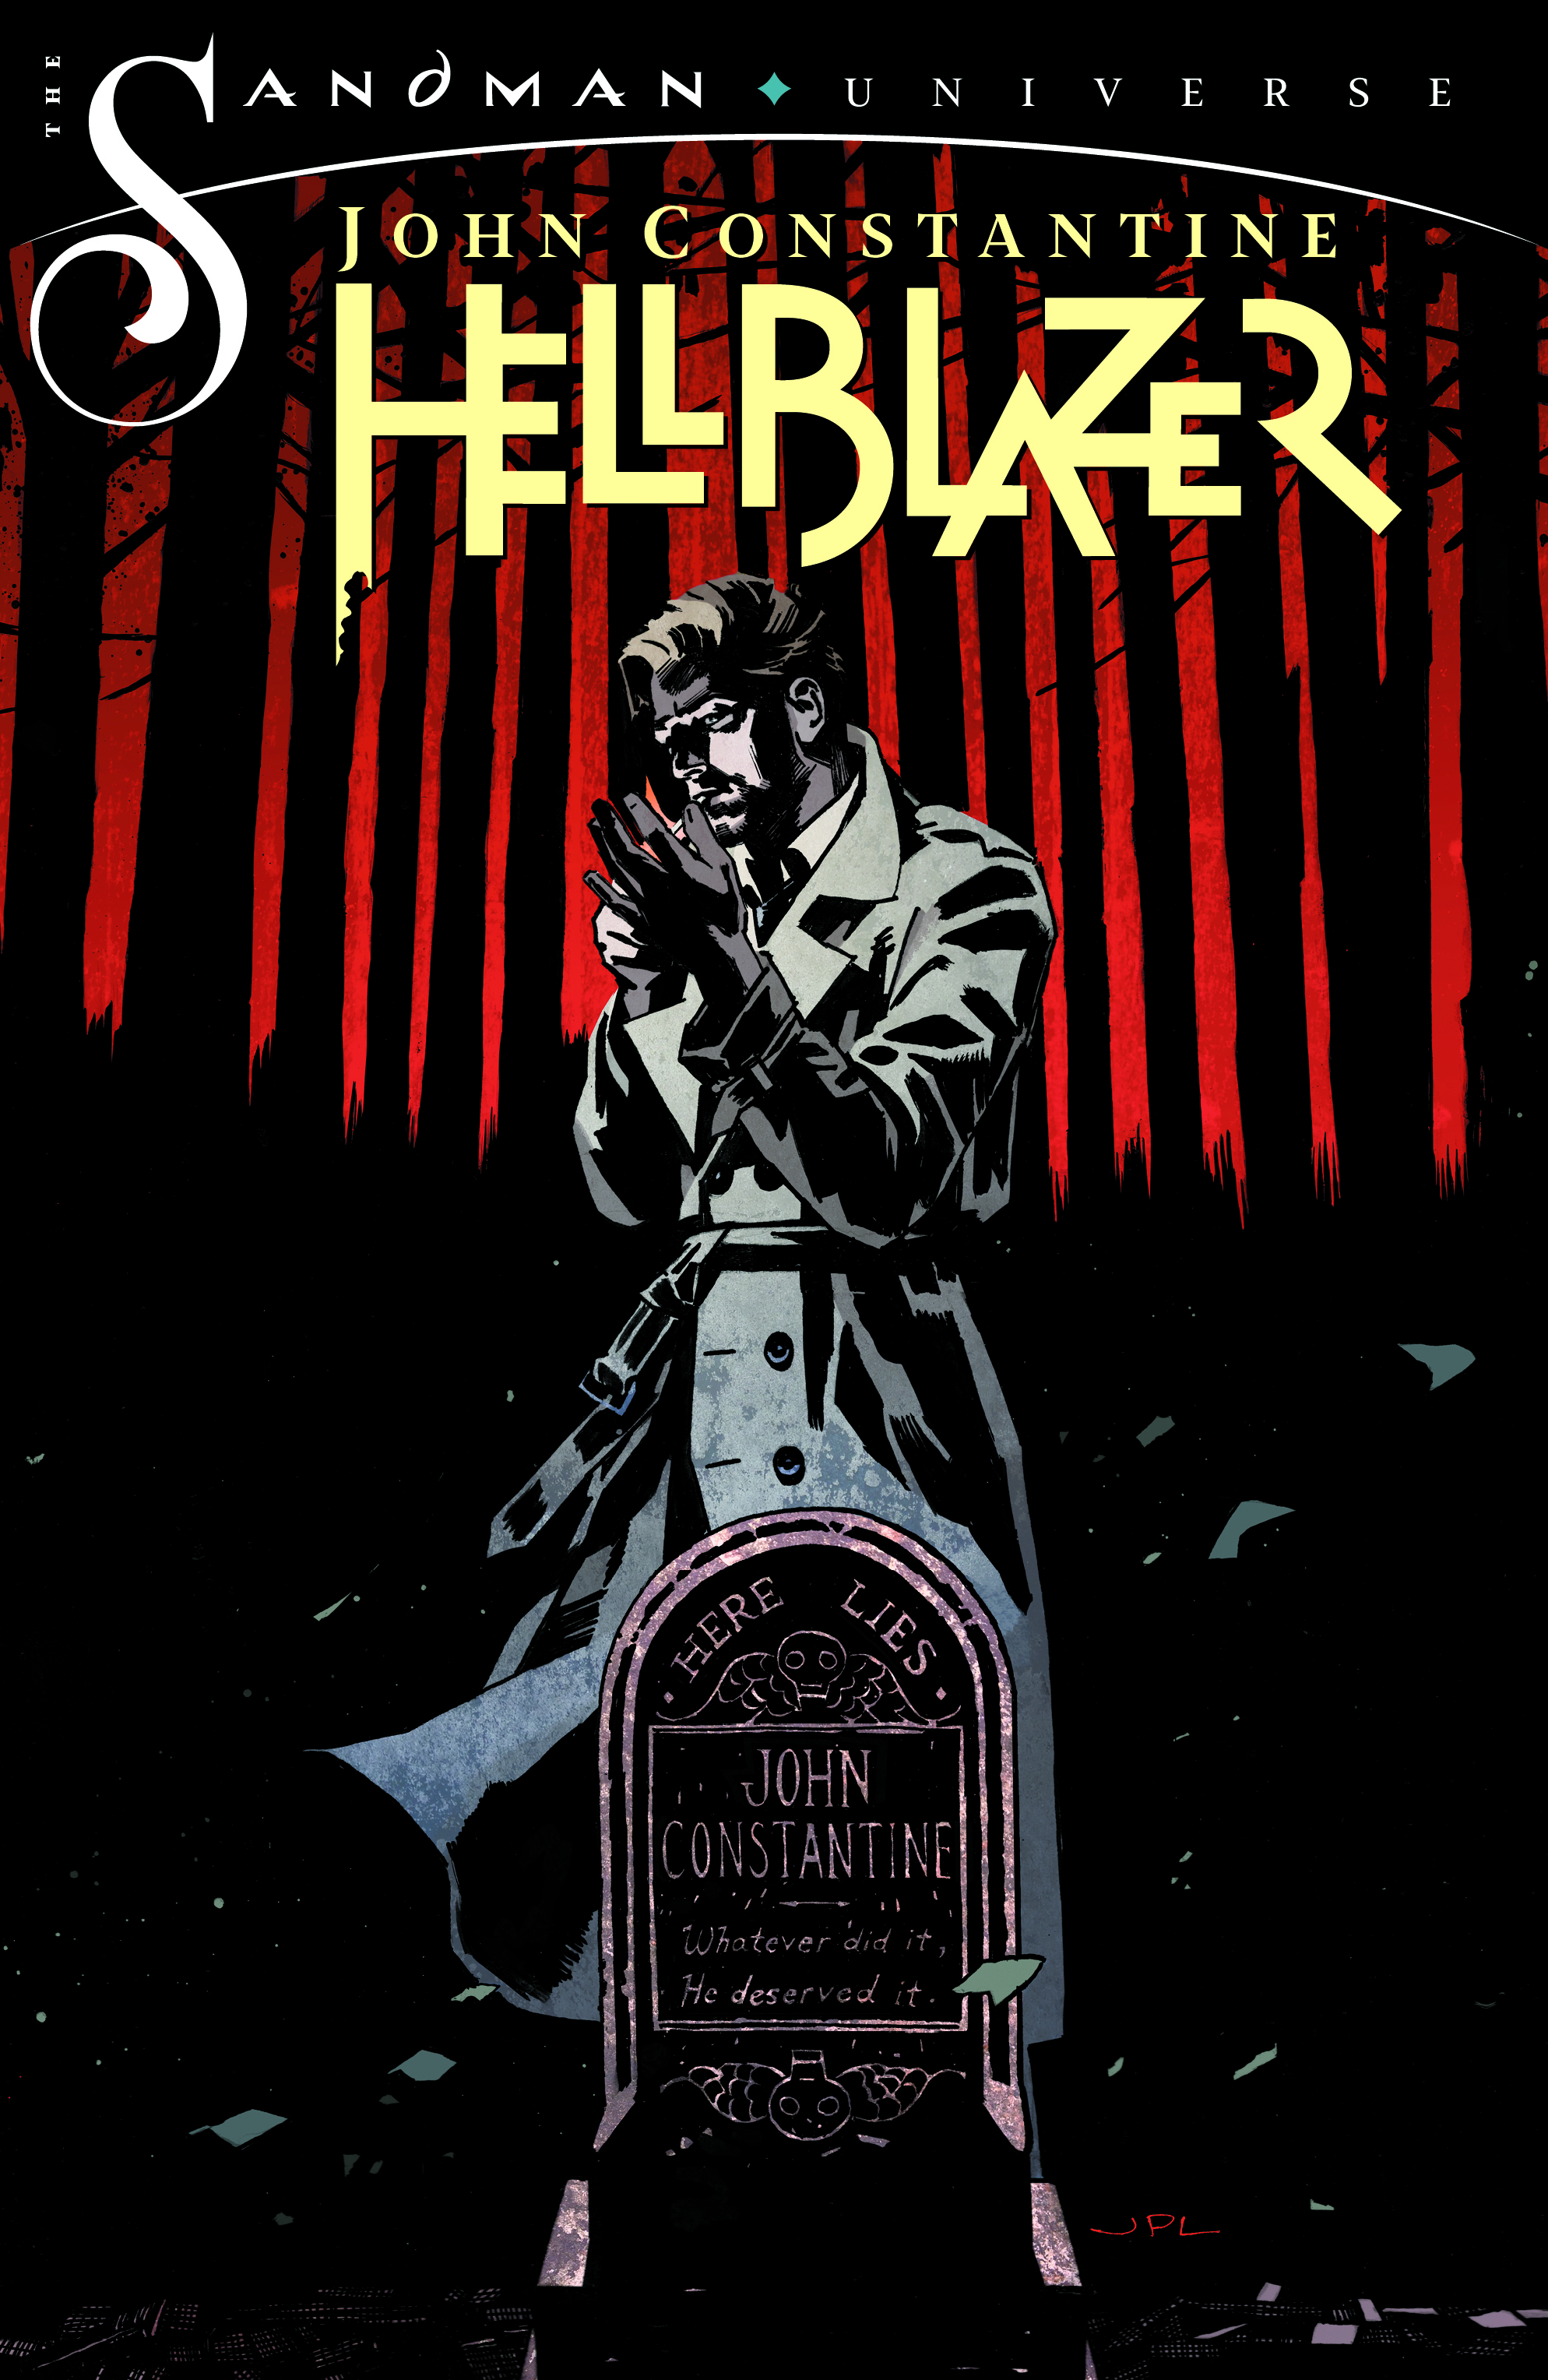 John Constantine returns to the Sandman Universe this fall